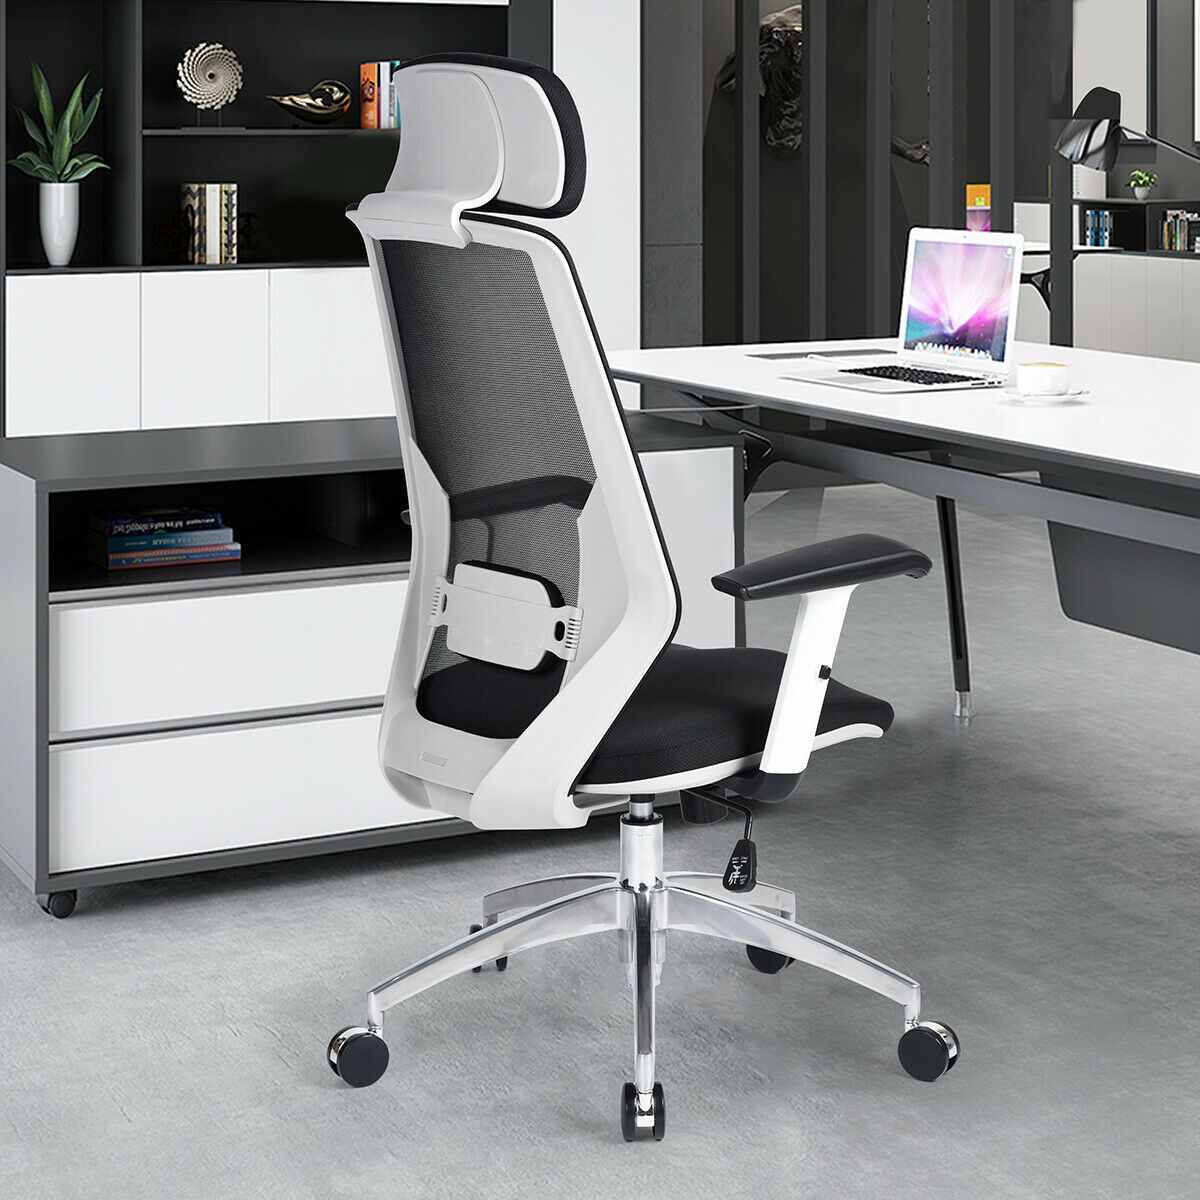 Ergonomic Task Chair Swivel High Back Herman Miller Aeron